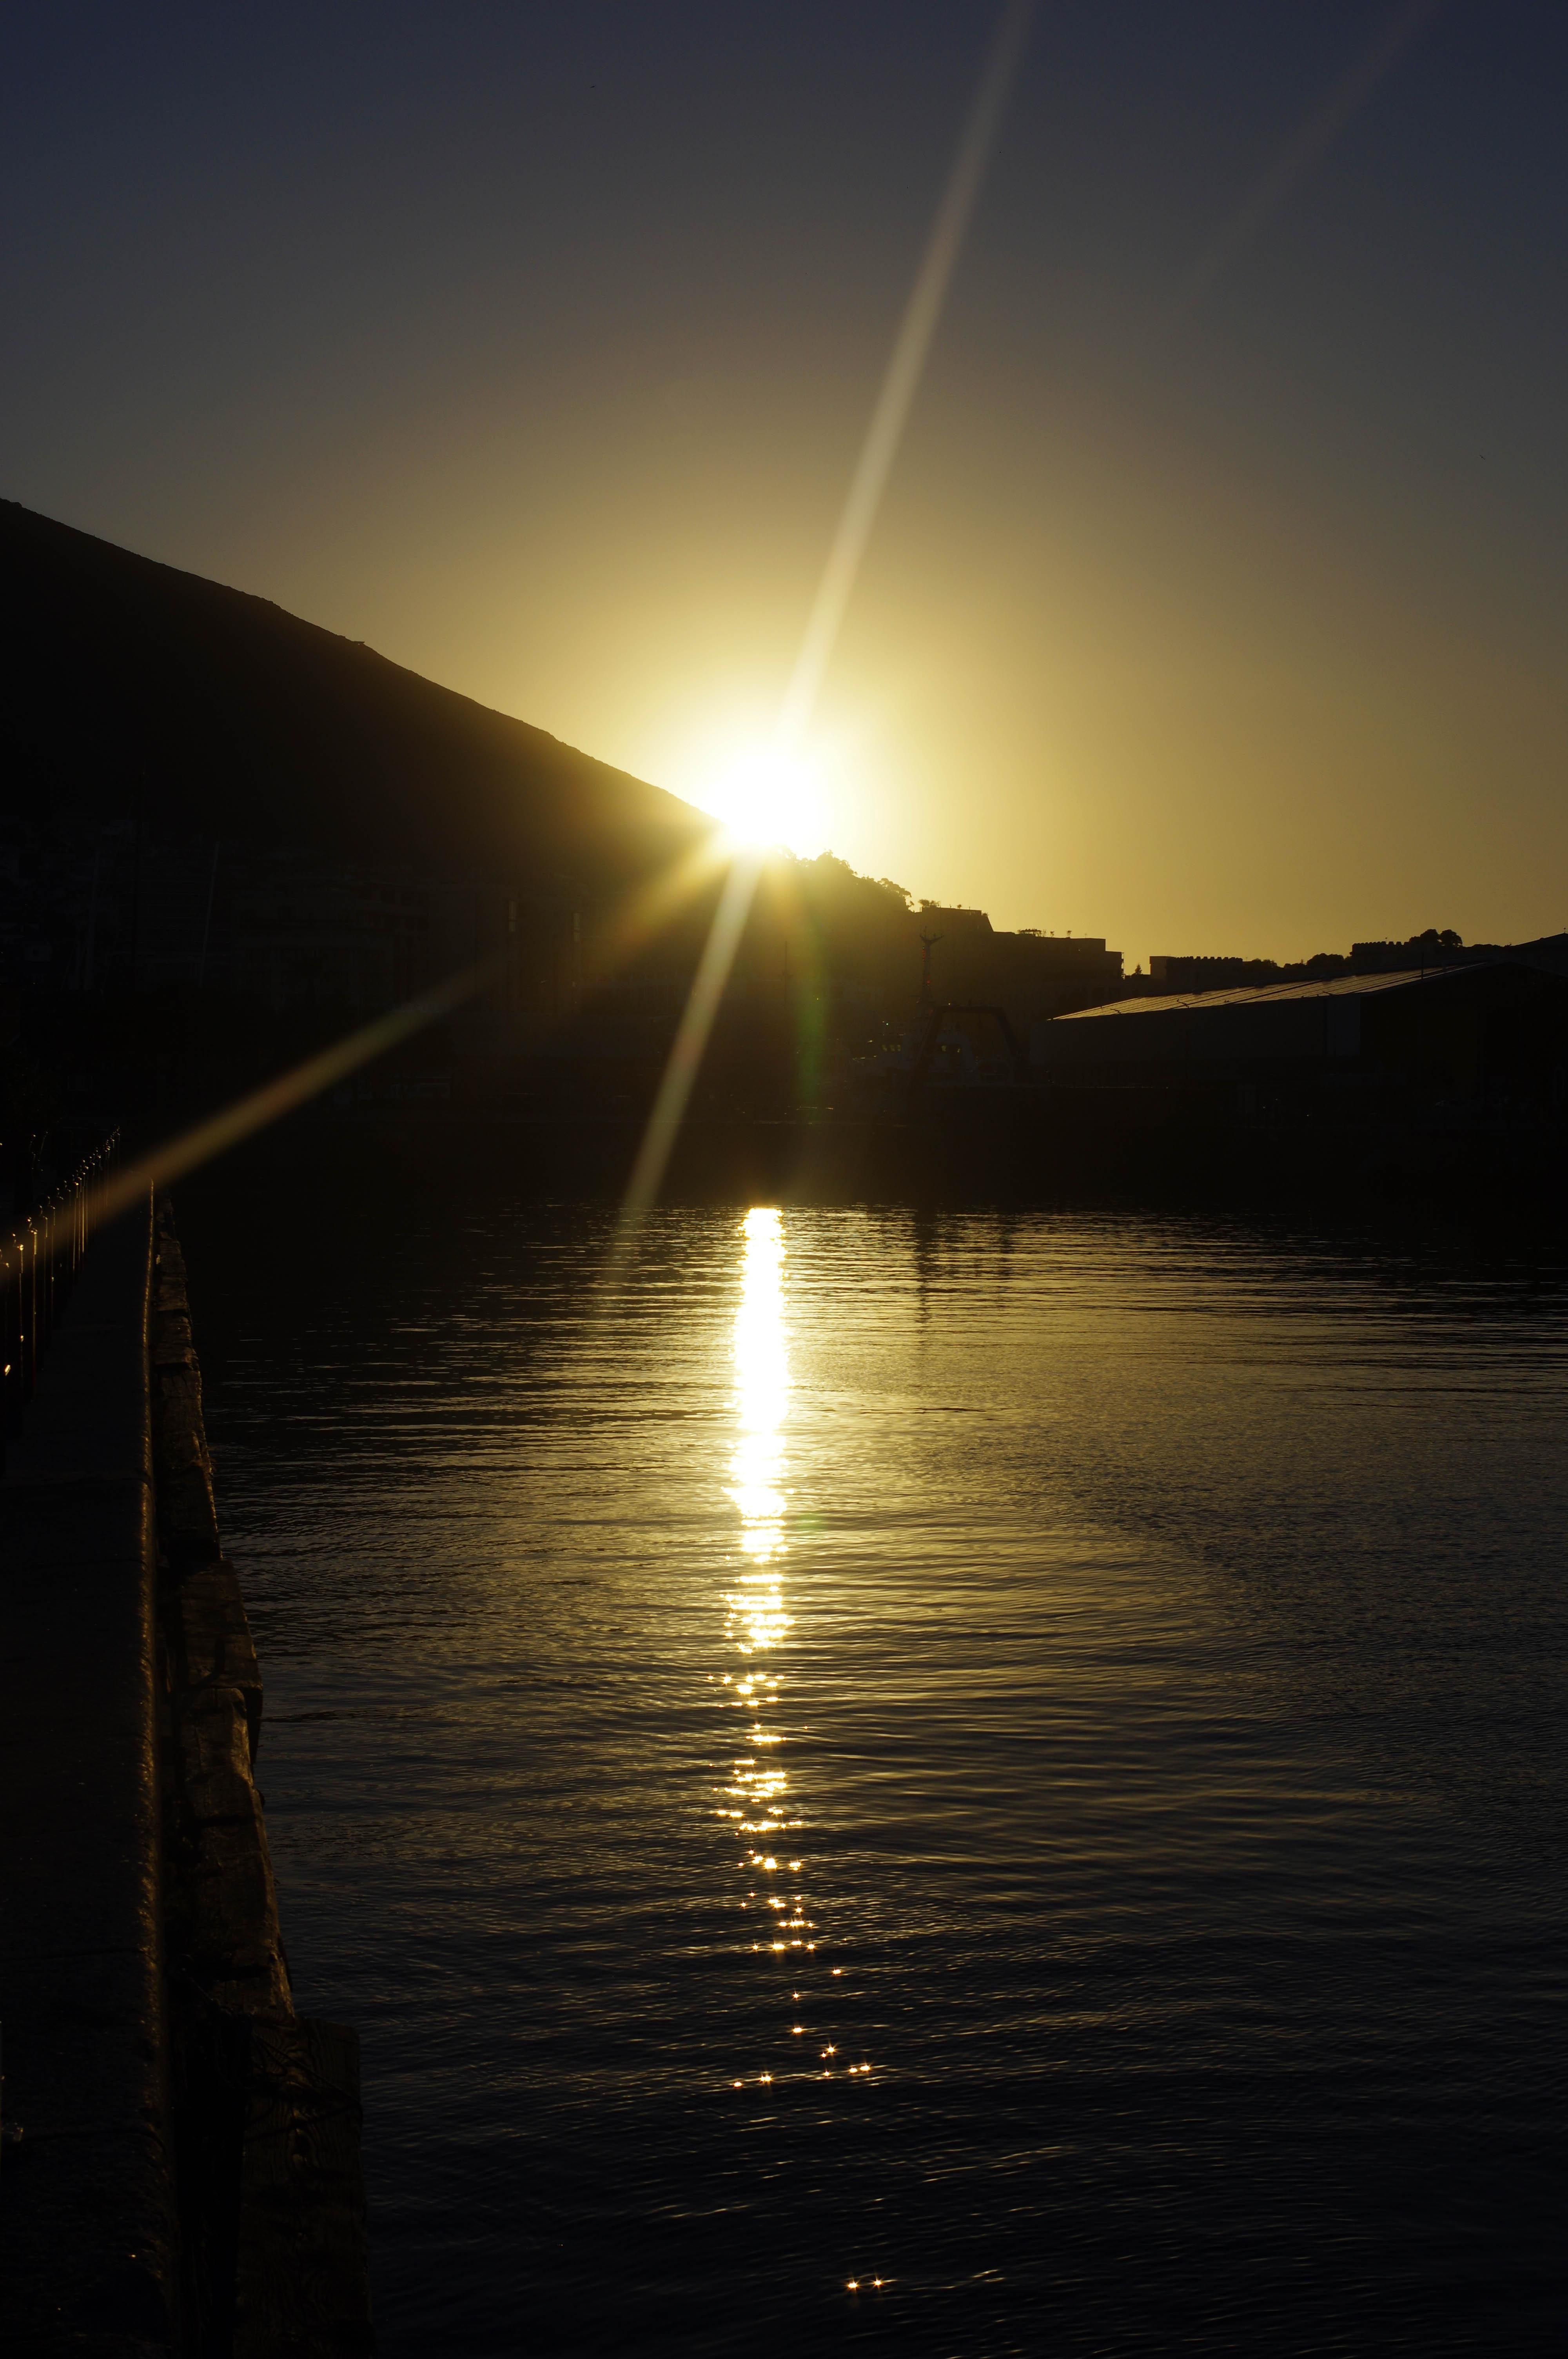 171122_CT_Robben island57